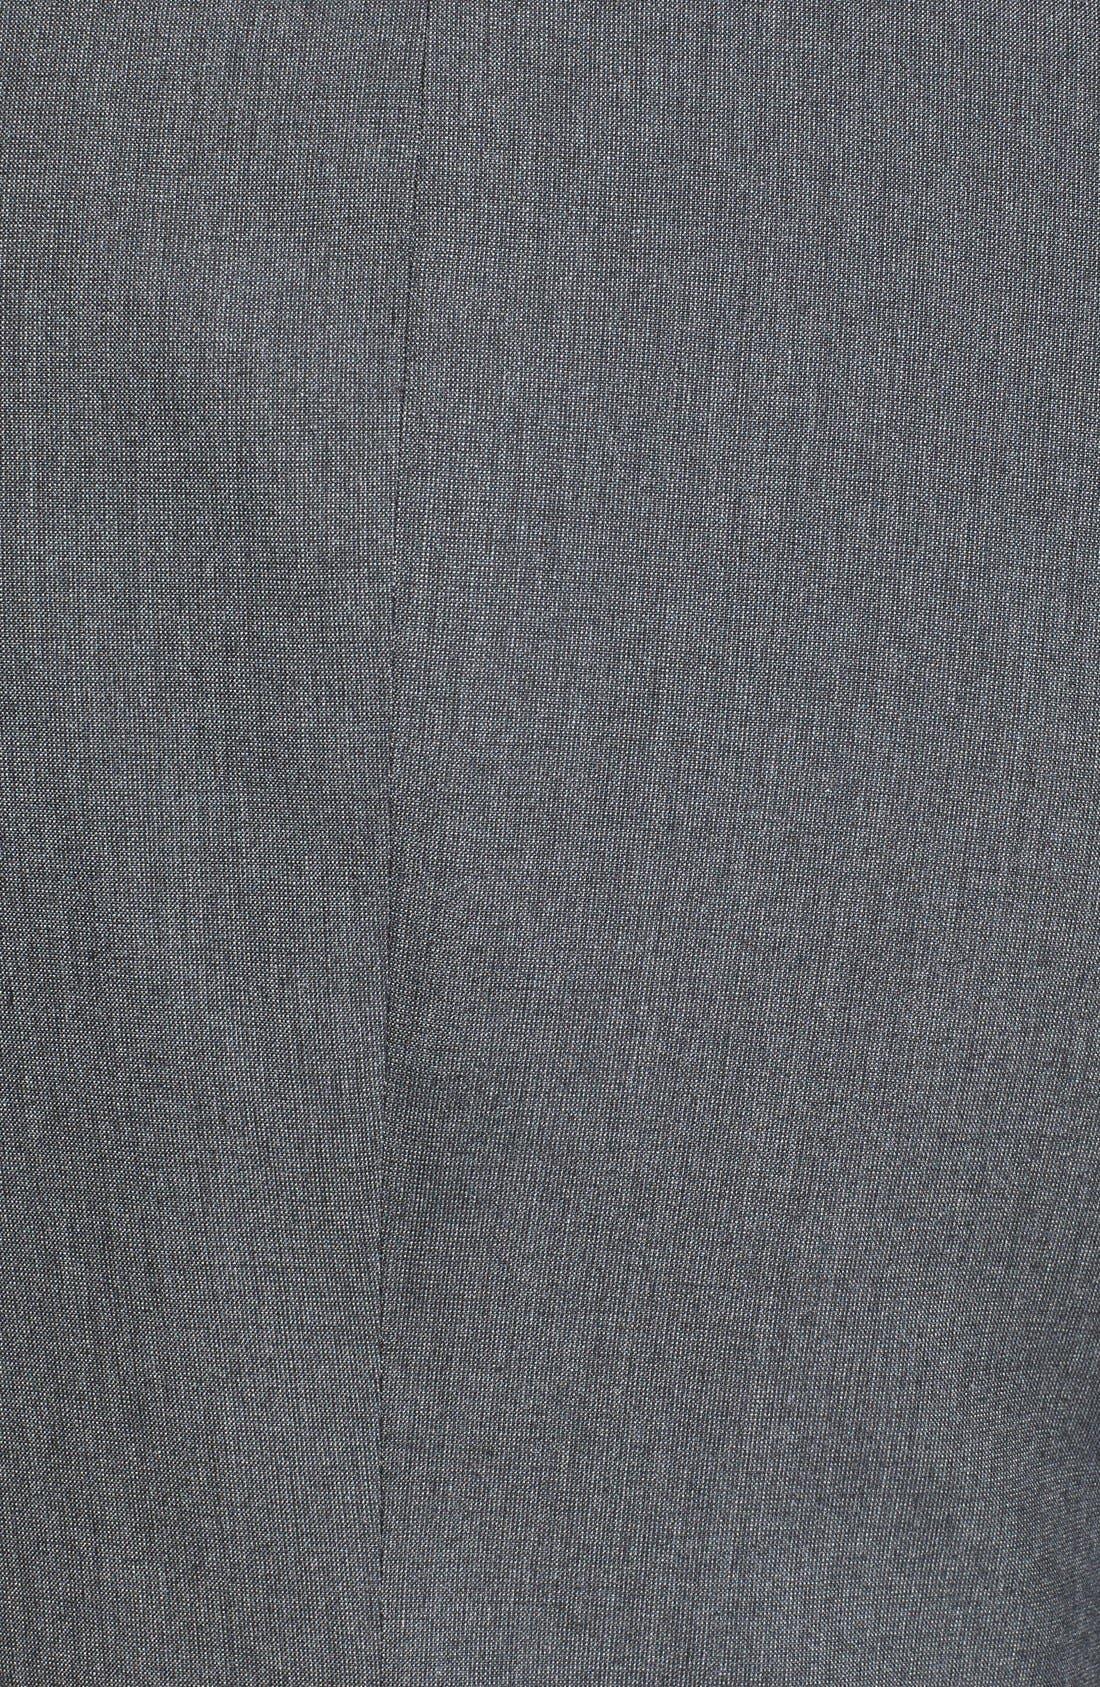 Alternate Image 3  - Topman Skinny Fit Satin Trim Grey Suit Jacket